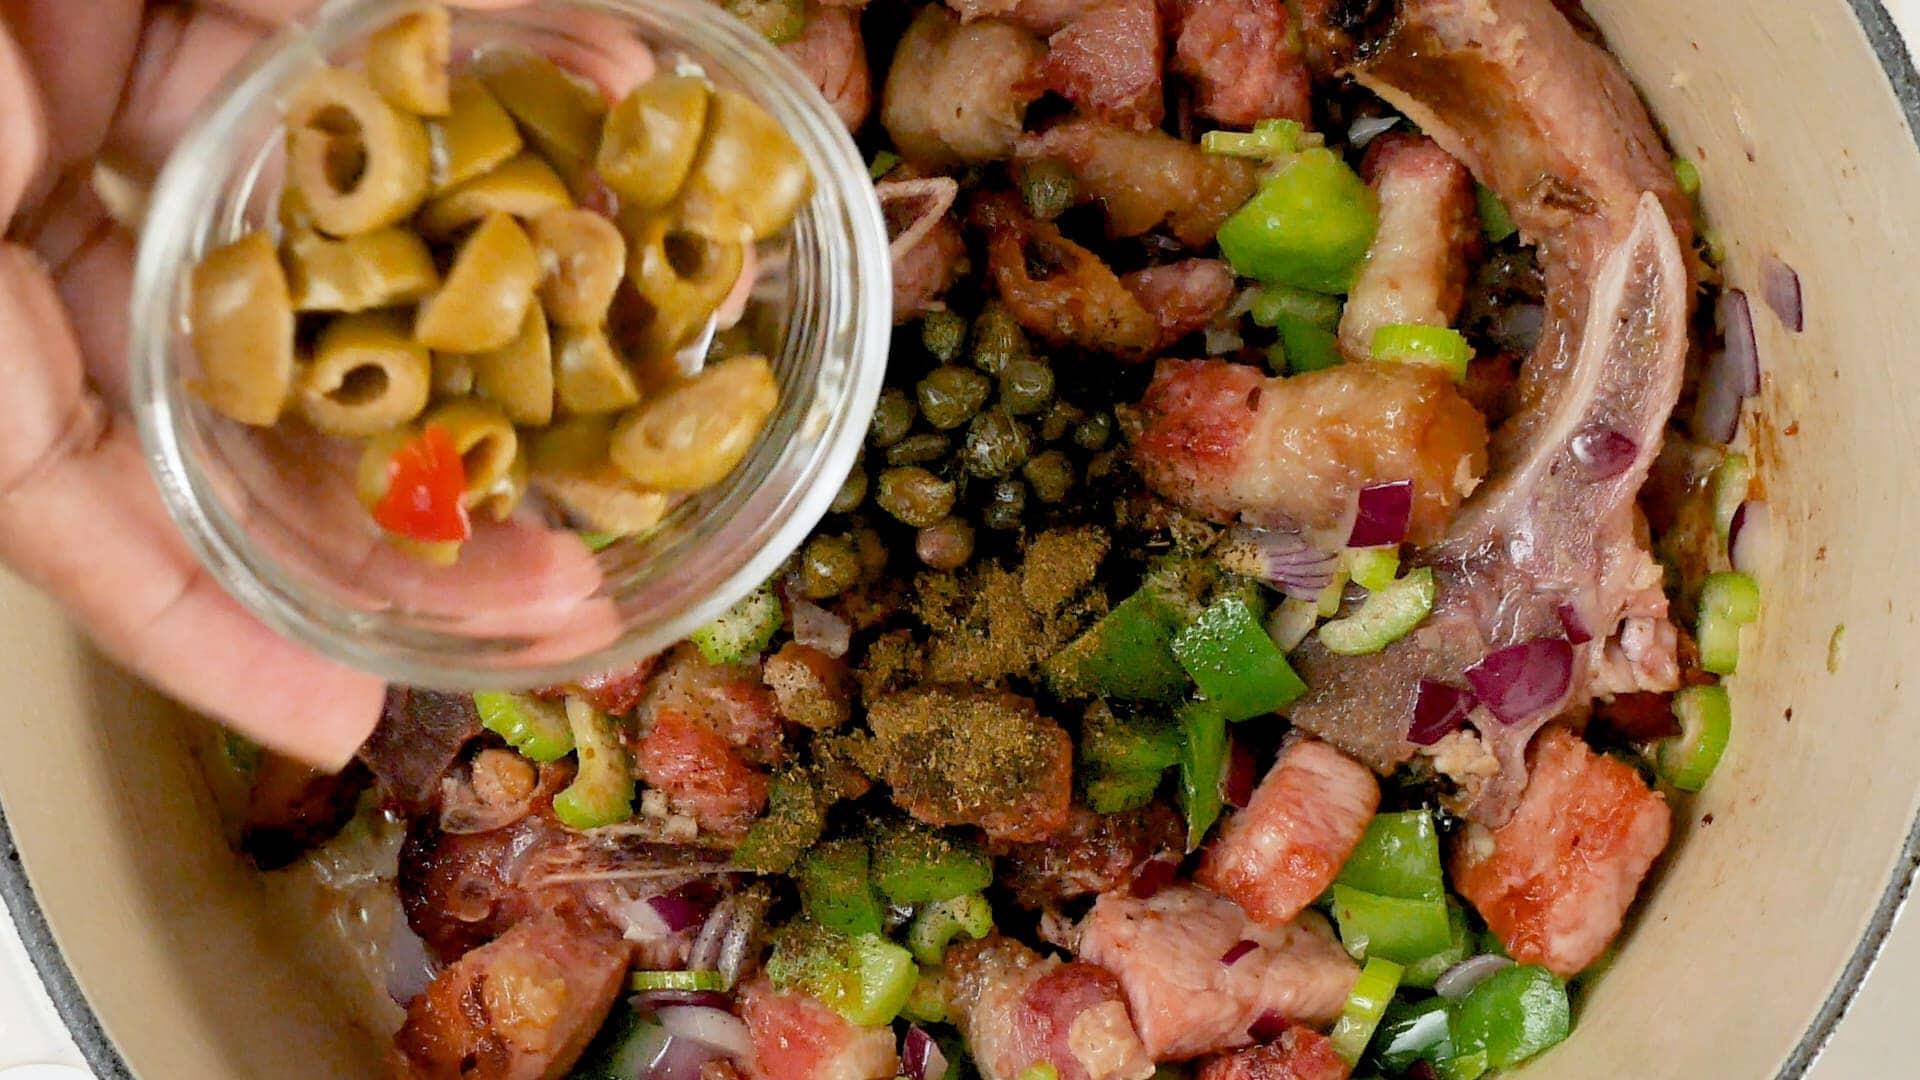 Adding the olives